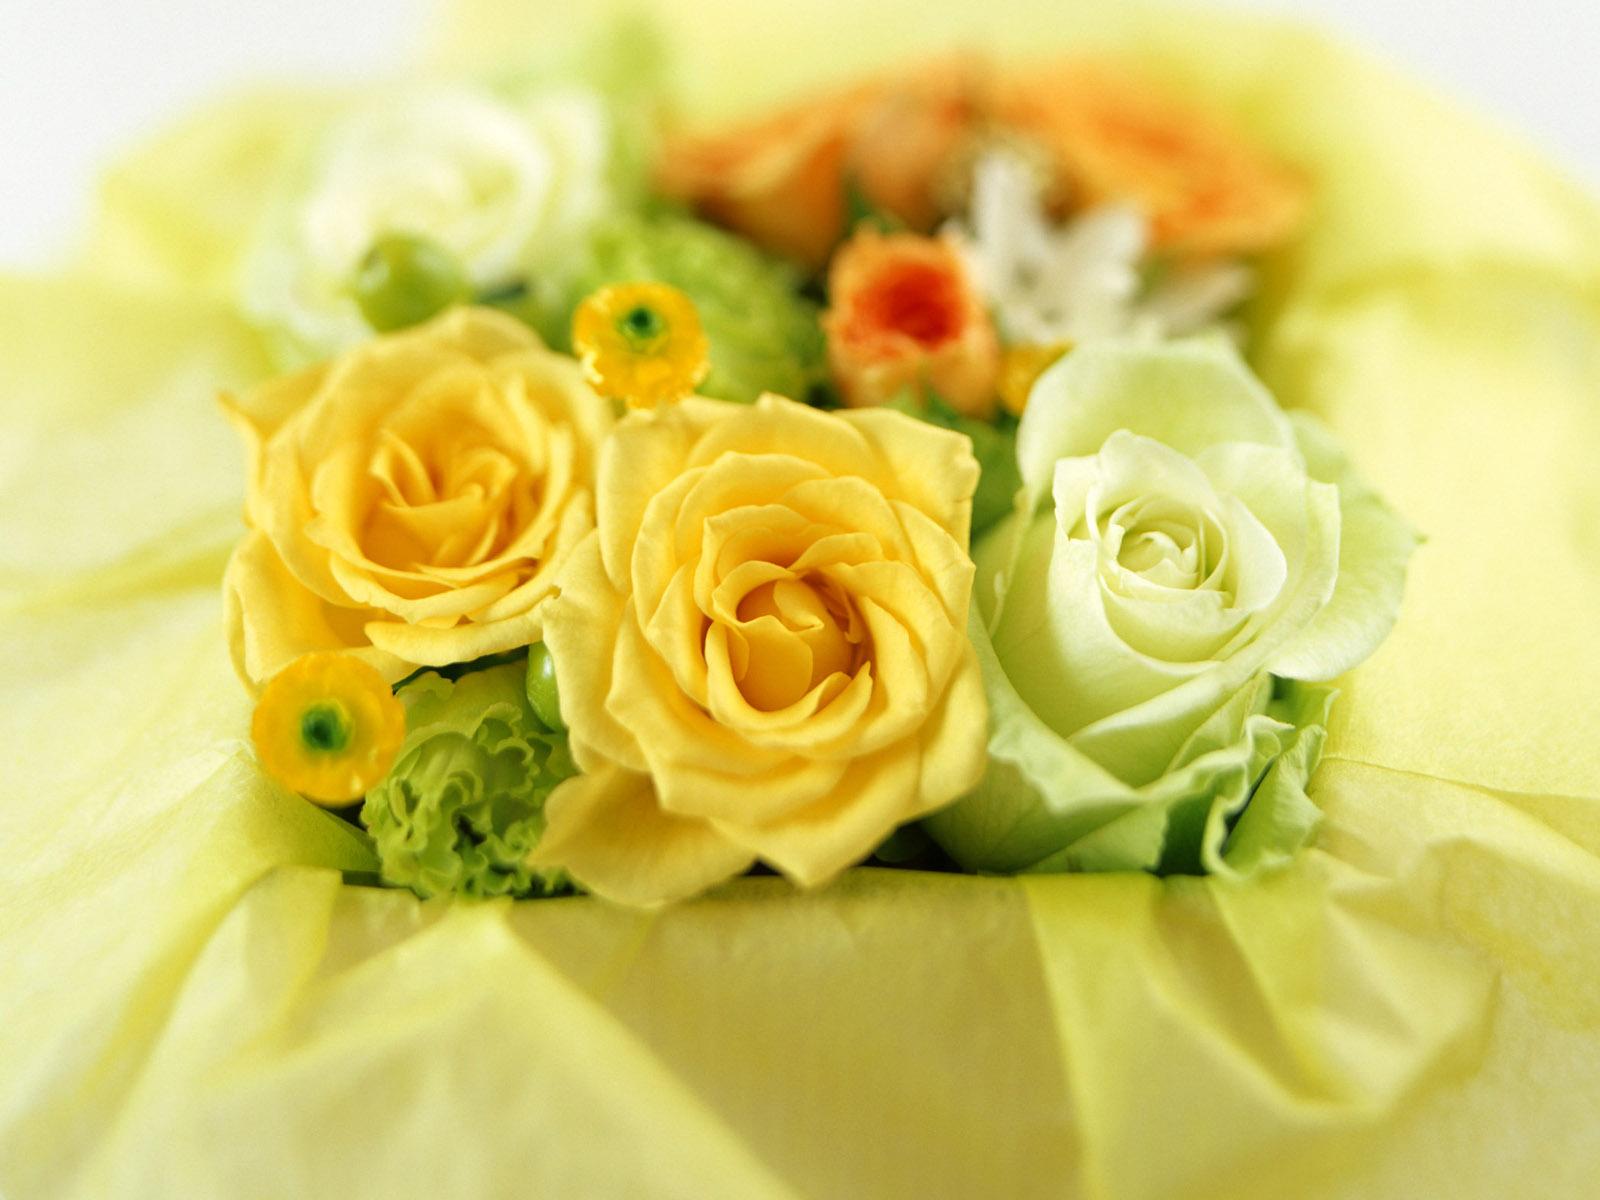 http://1.bp.blogspot.com/_cY1l96f0e6c/TMaWSXnrB9I/AAAAAAAAAcU/NYuH42OCc9Y/s1600/F+38.jpg